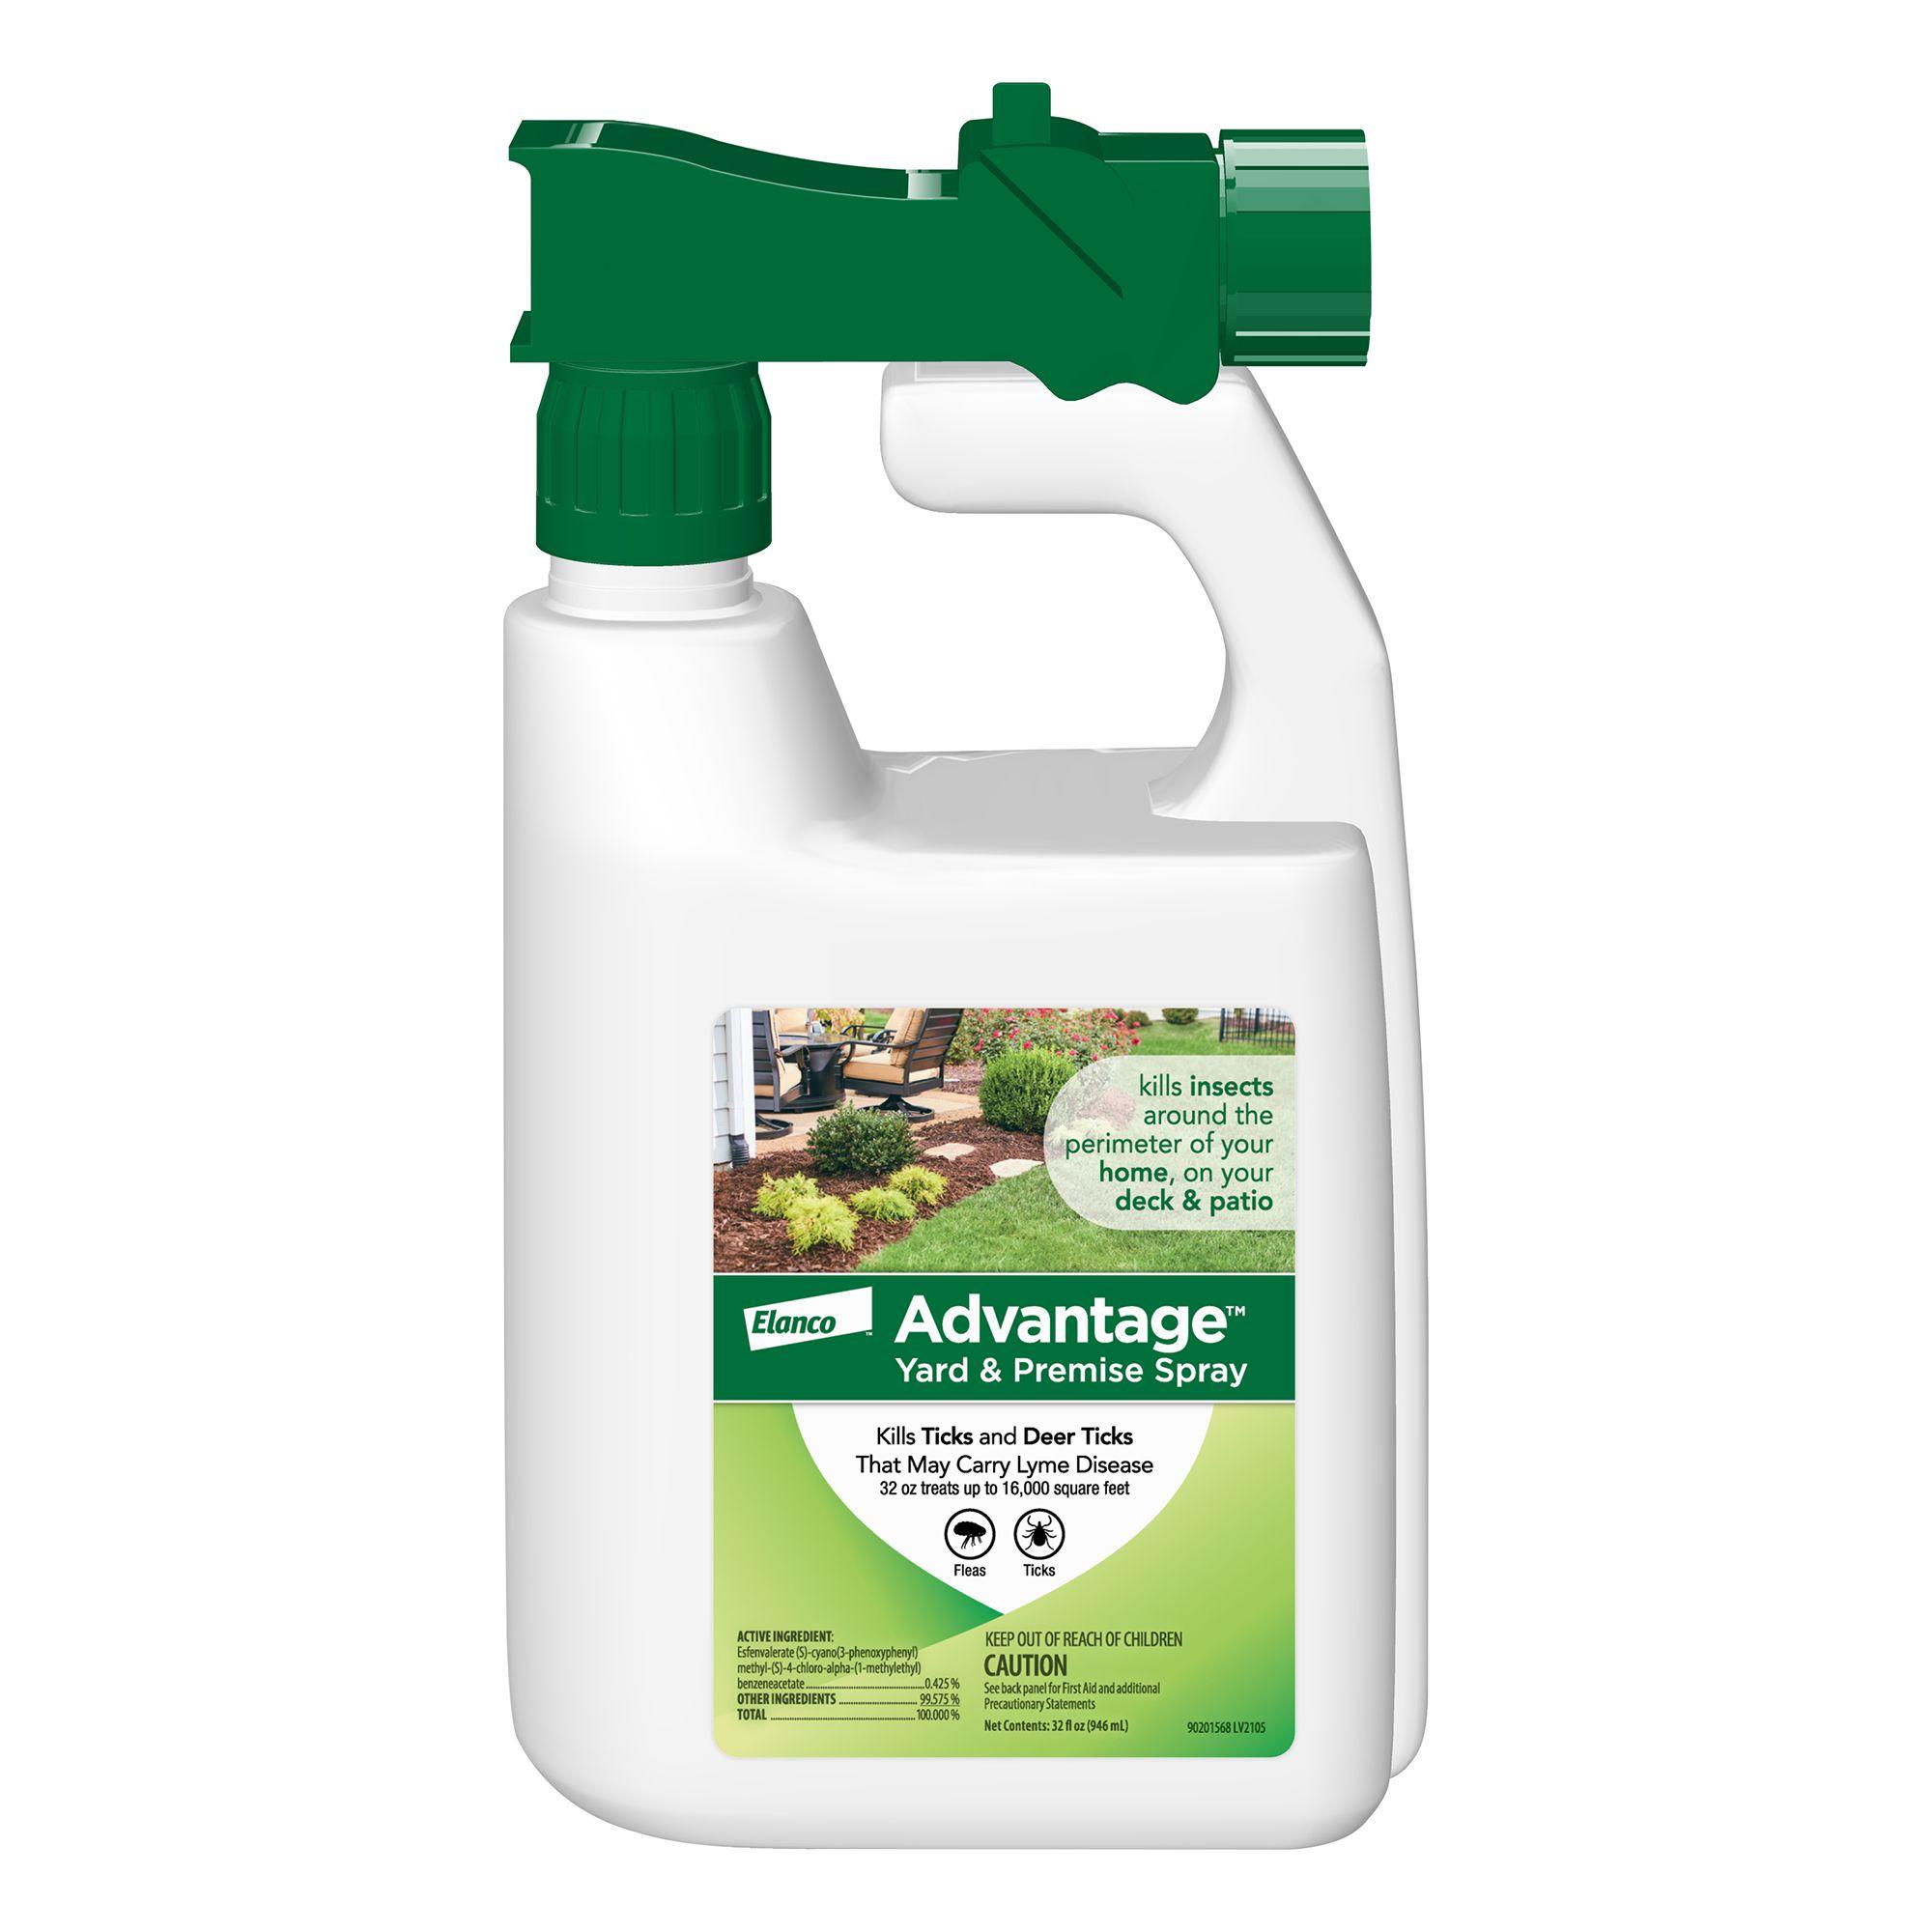 Advantage Yard and Premise Spray 5214386